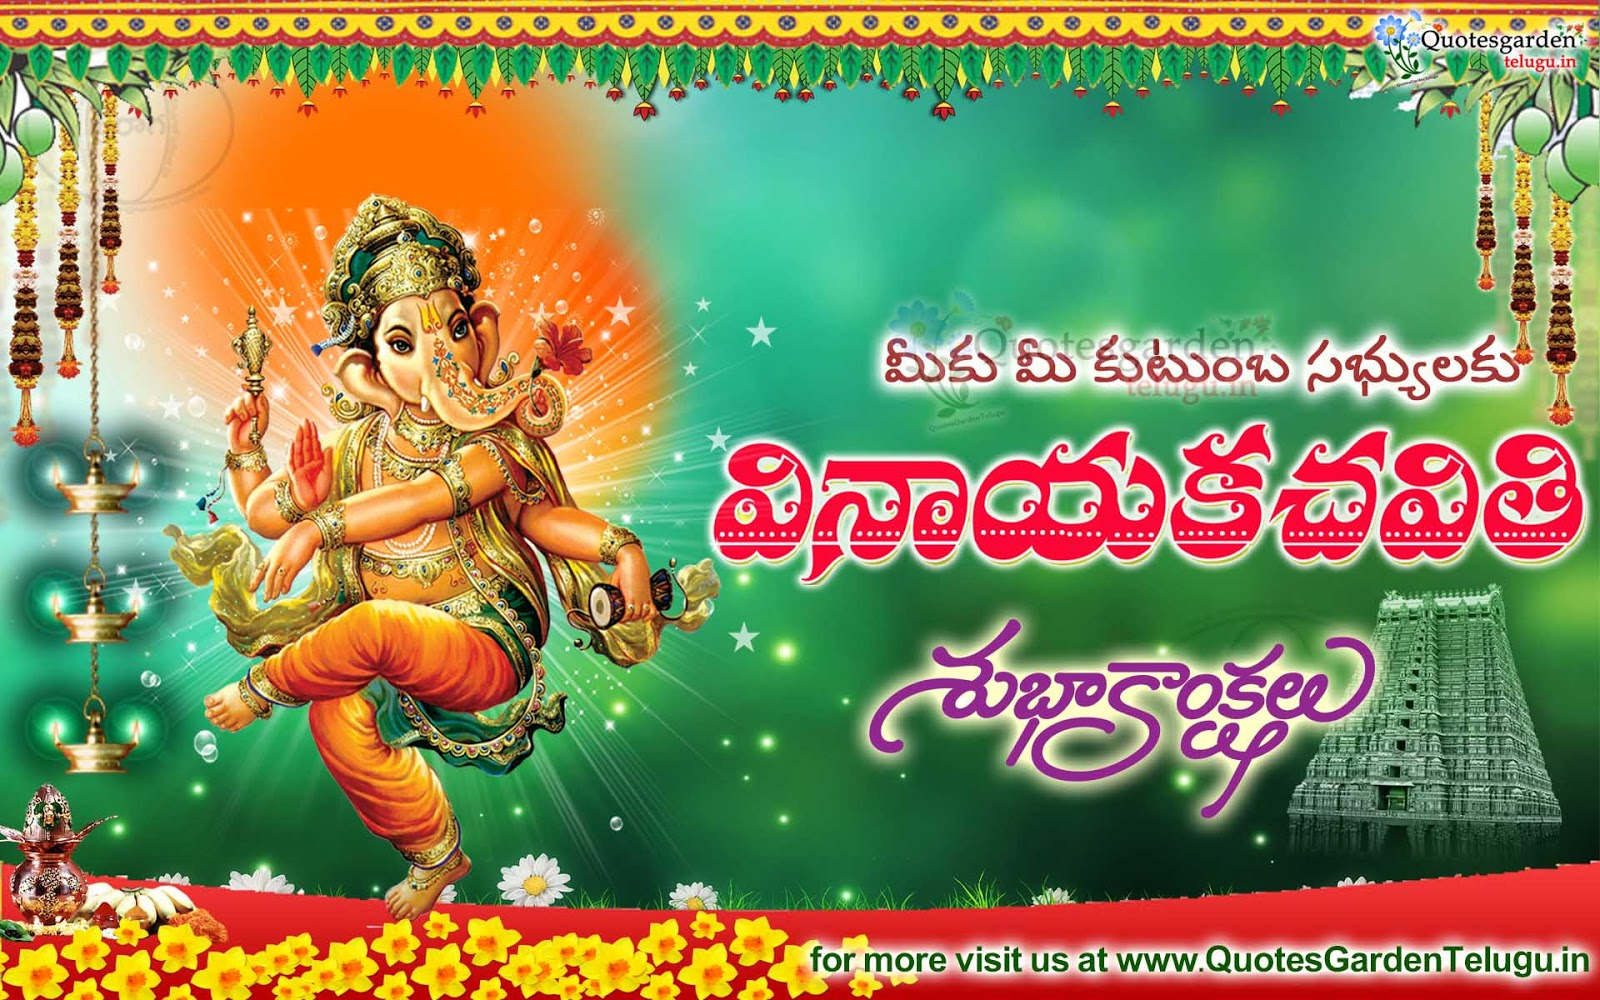 Beautiful Heart Touching Quotes Wallpapers Vinayaka Chavithi 2017 Wishes Telugu Sms Quotes Garden